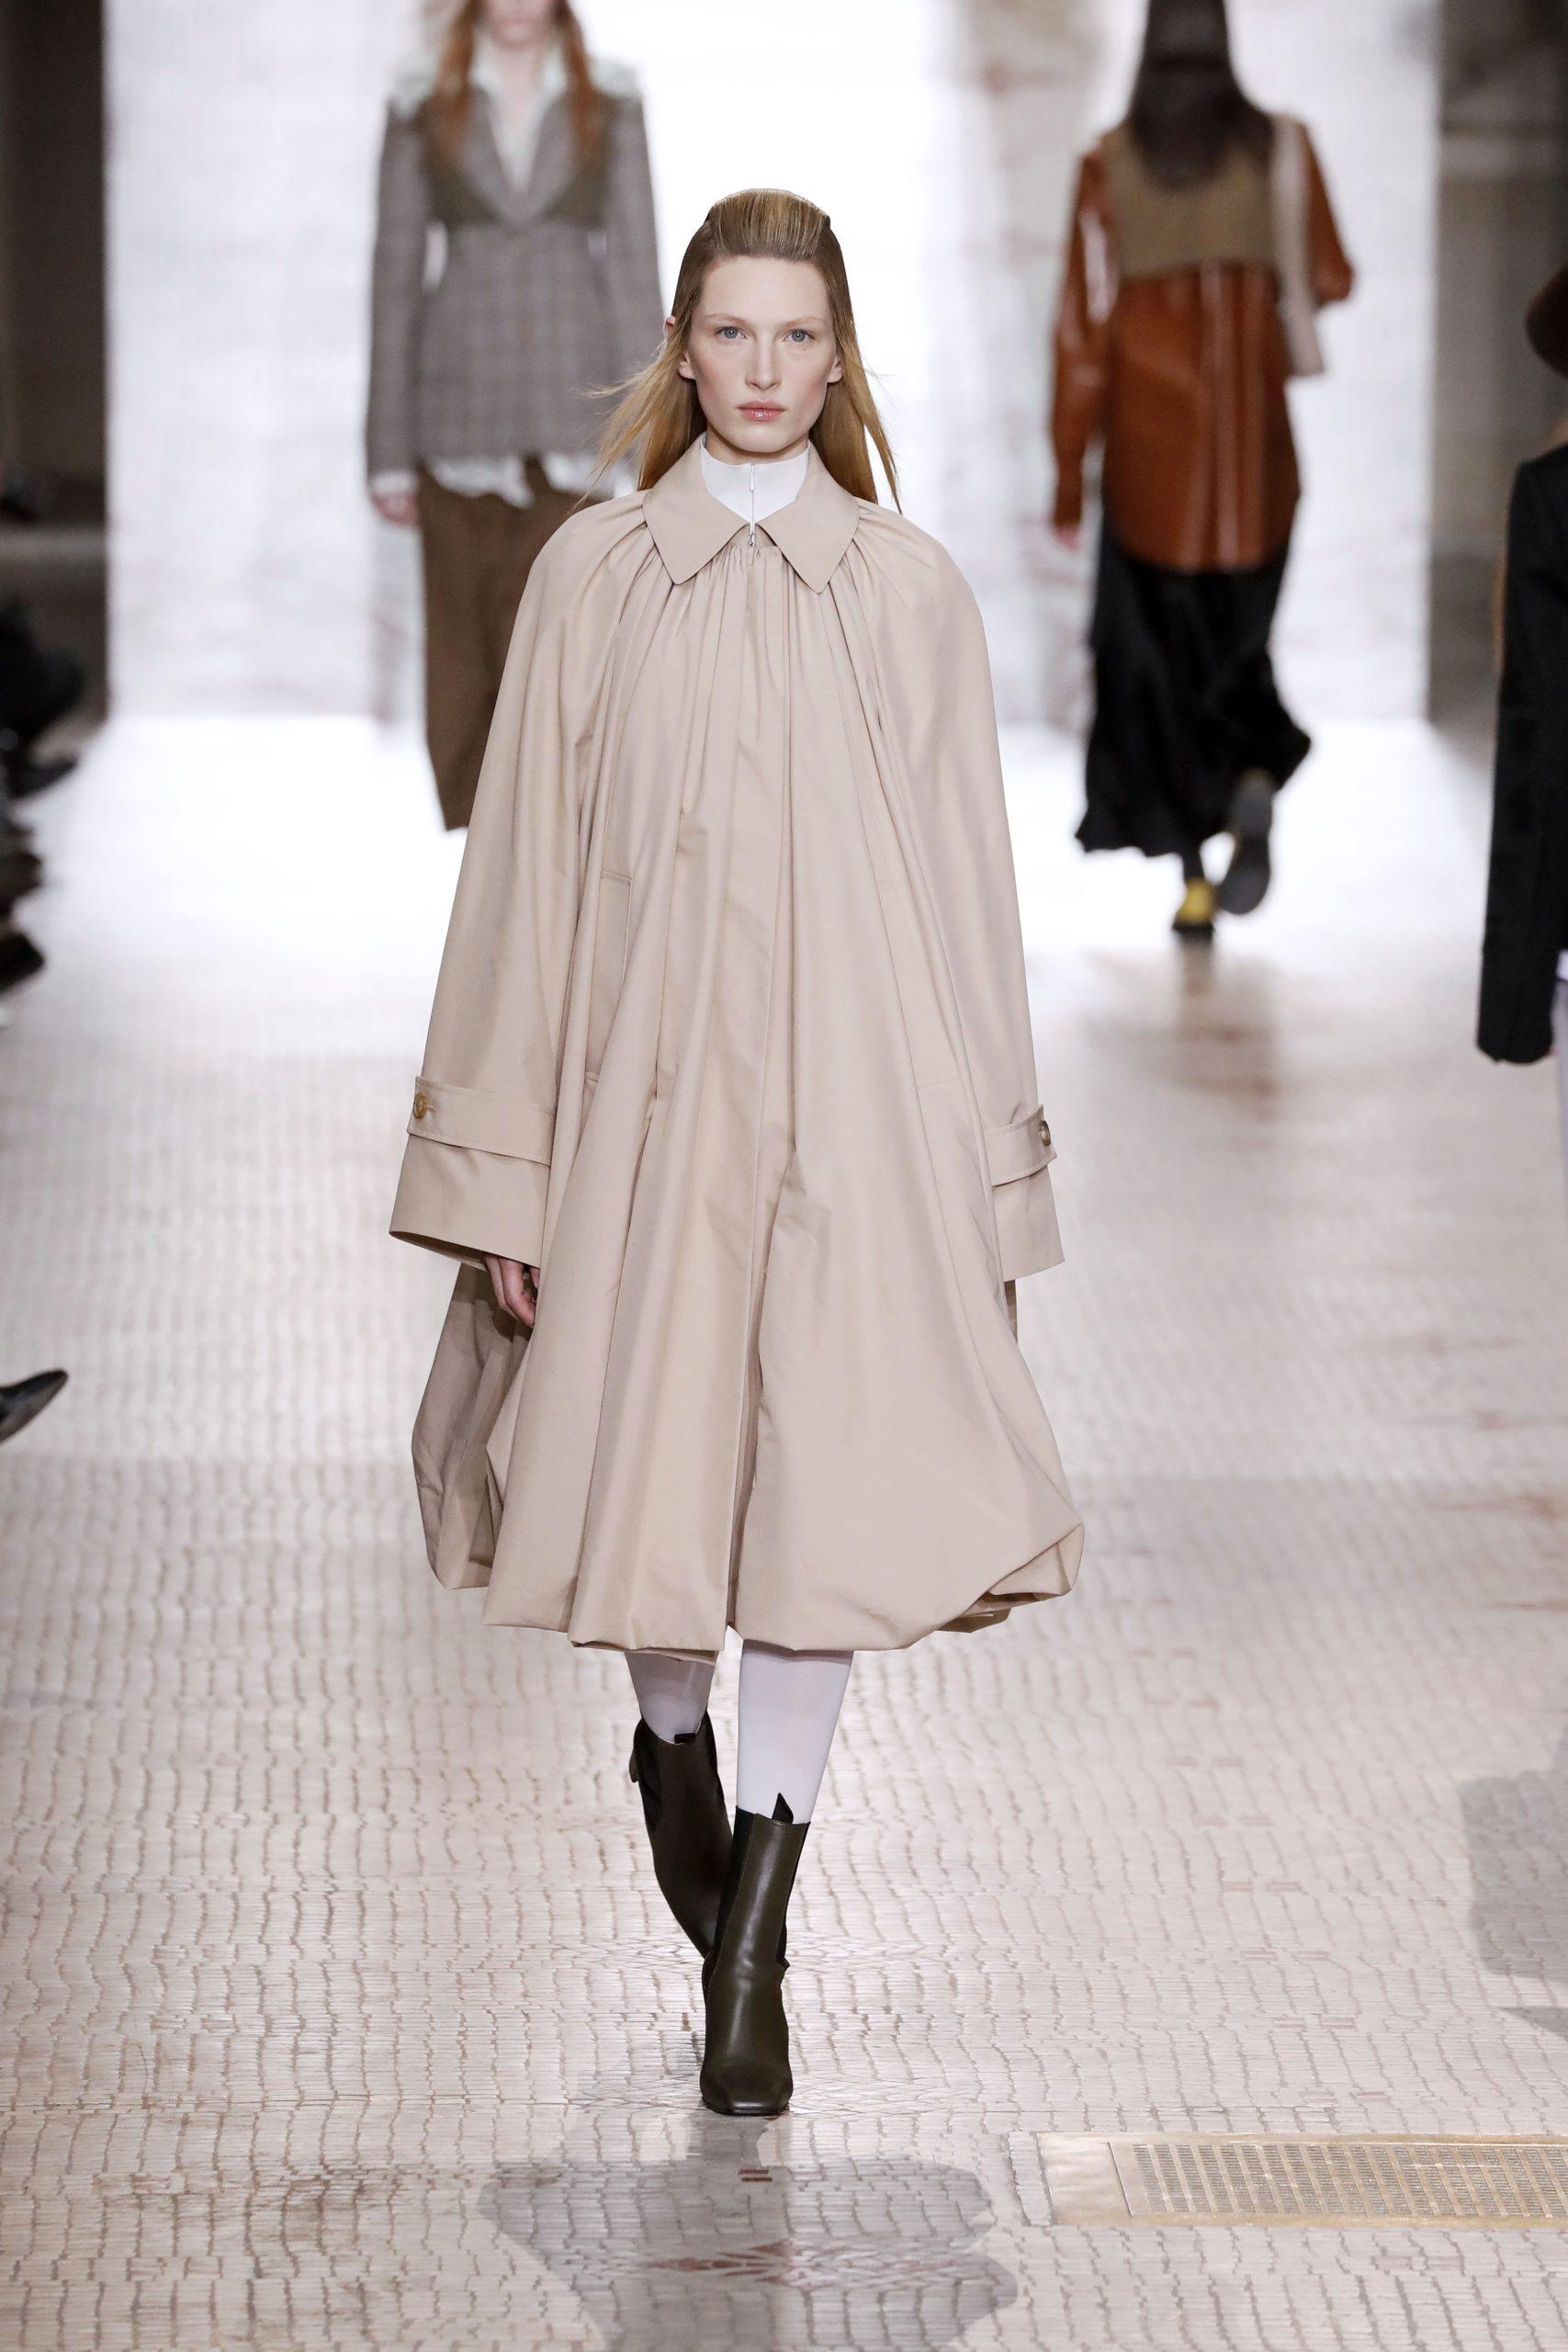 модный тренд плащ осень 2020 бежевый оверсайз объемный